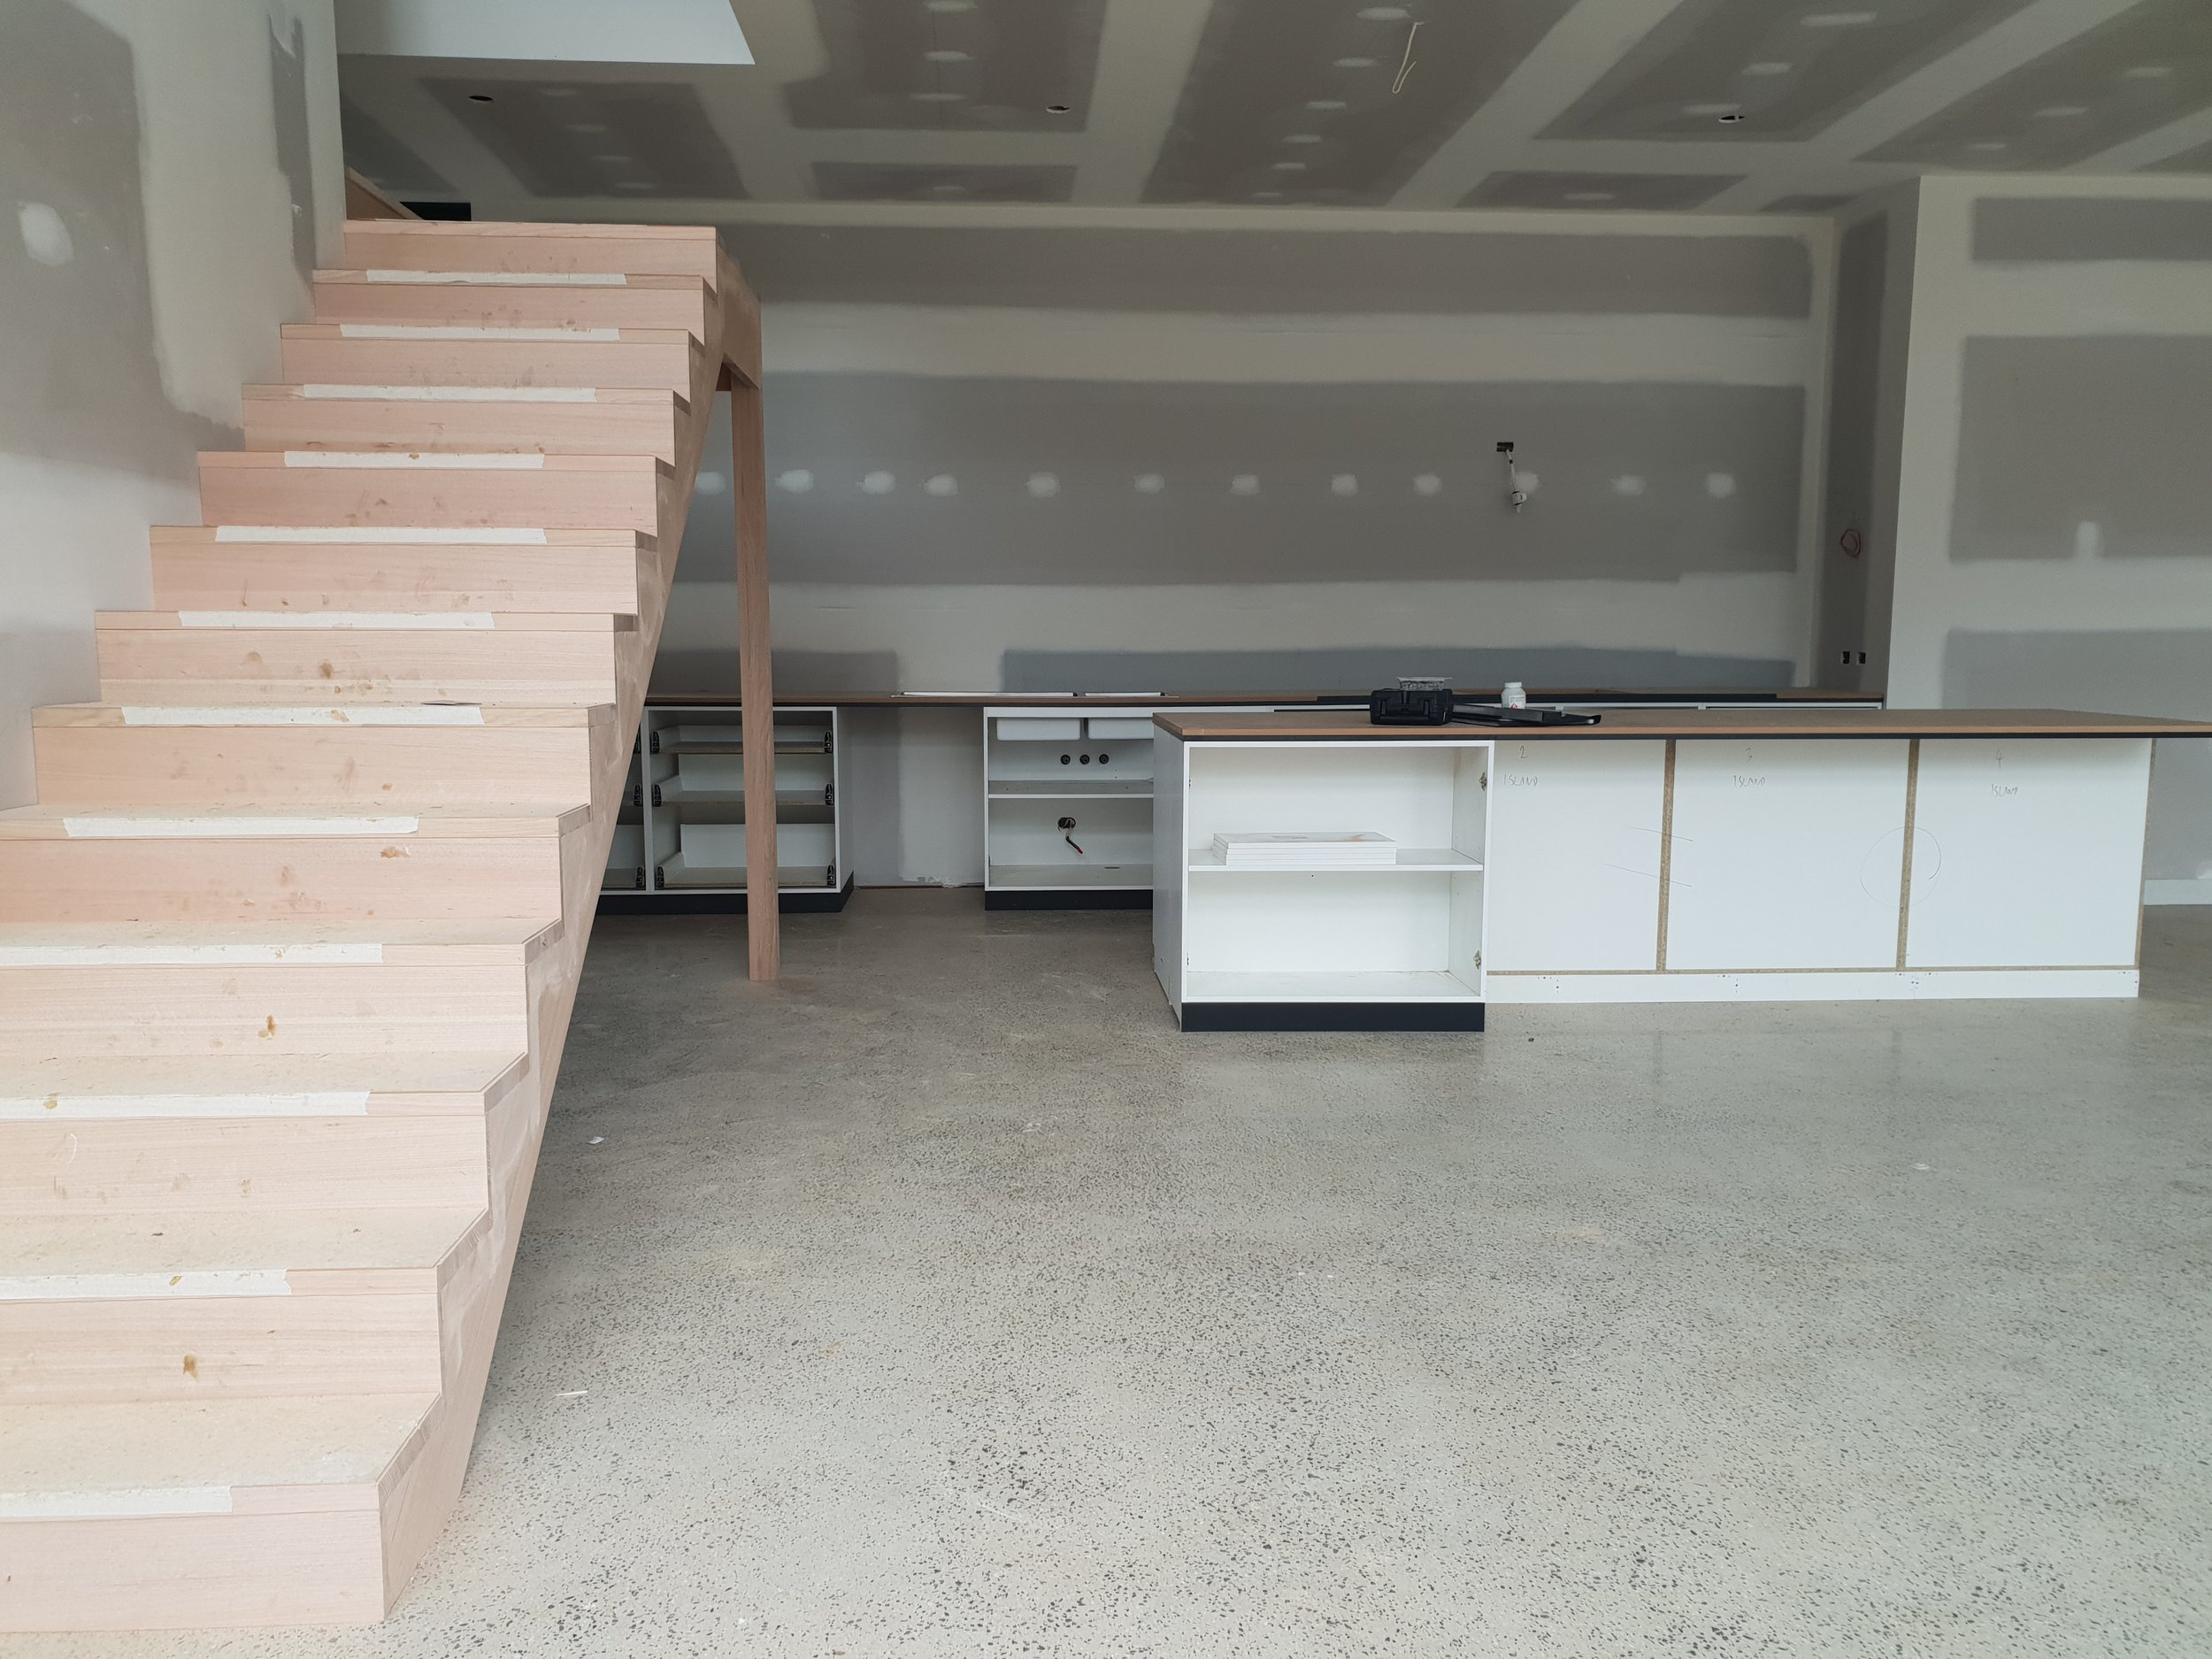 lifespaces bluestone house kitchen stairs.jpg